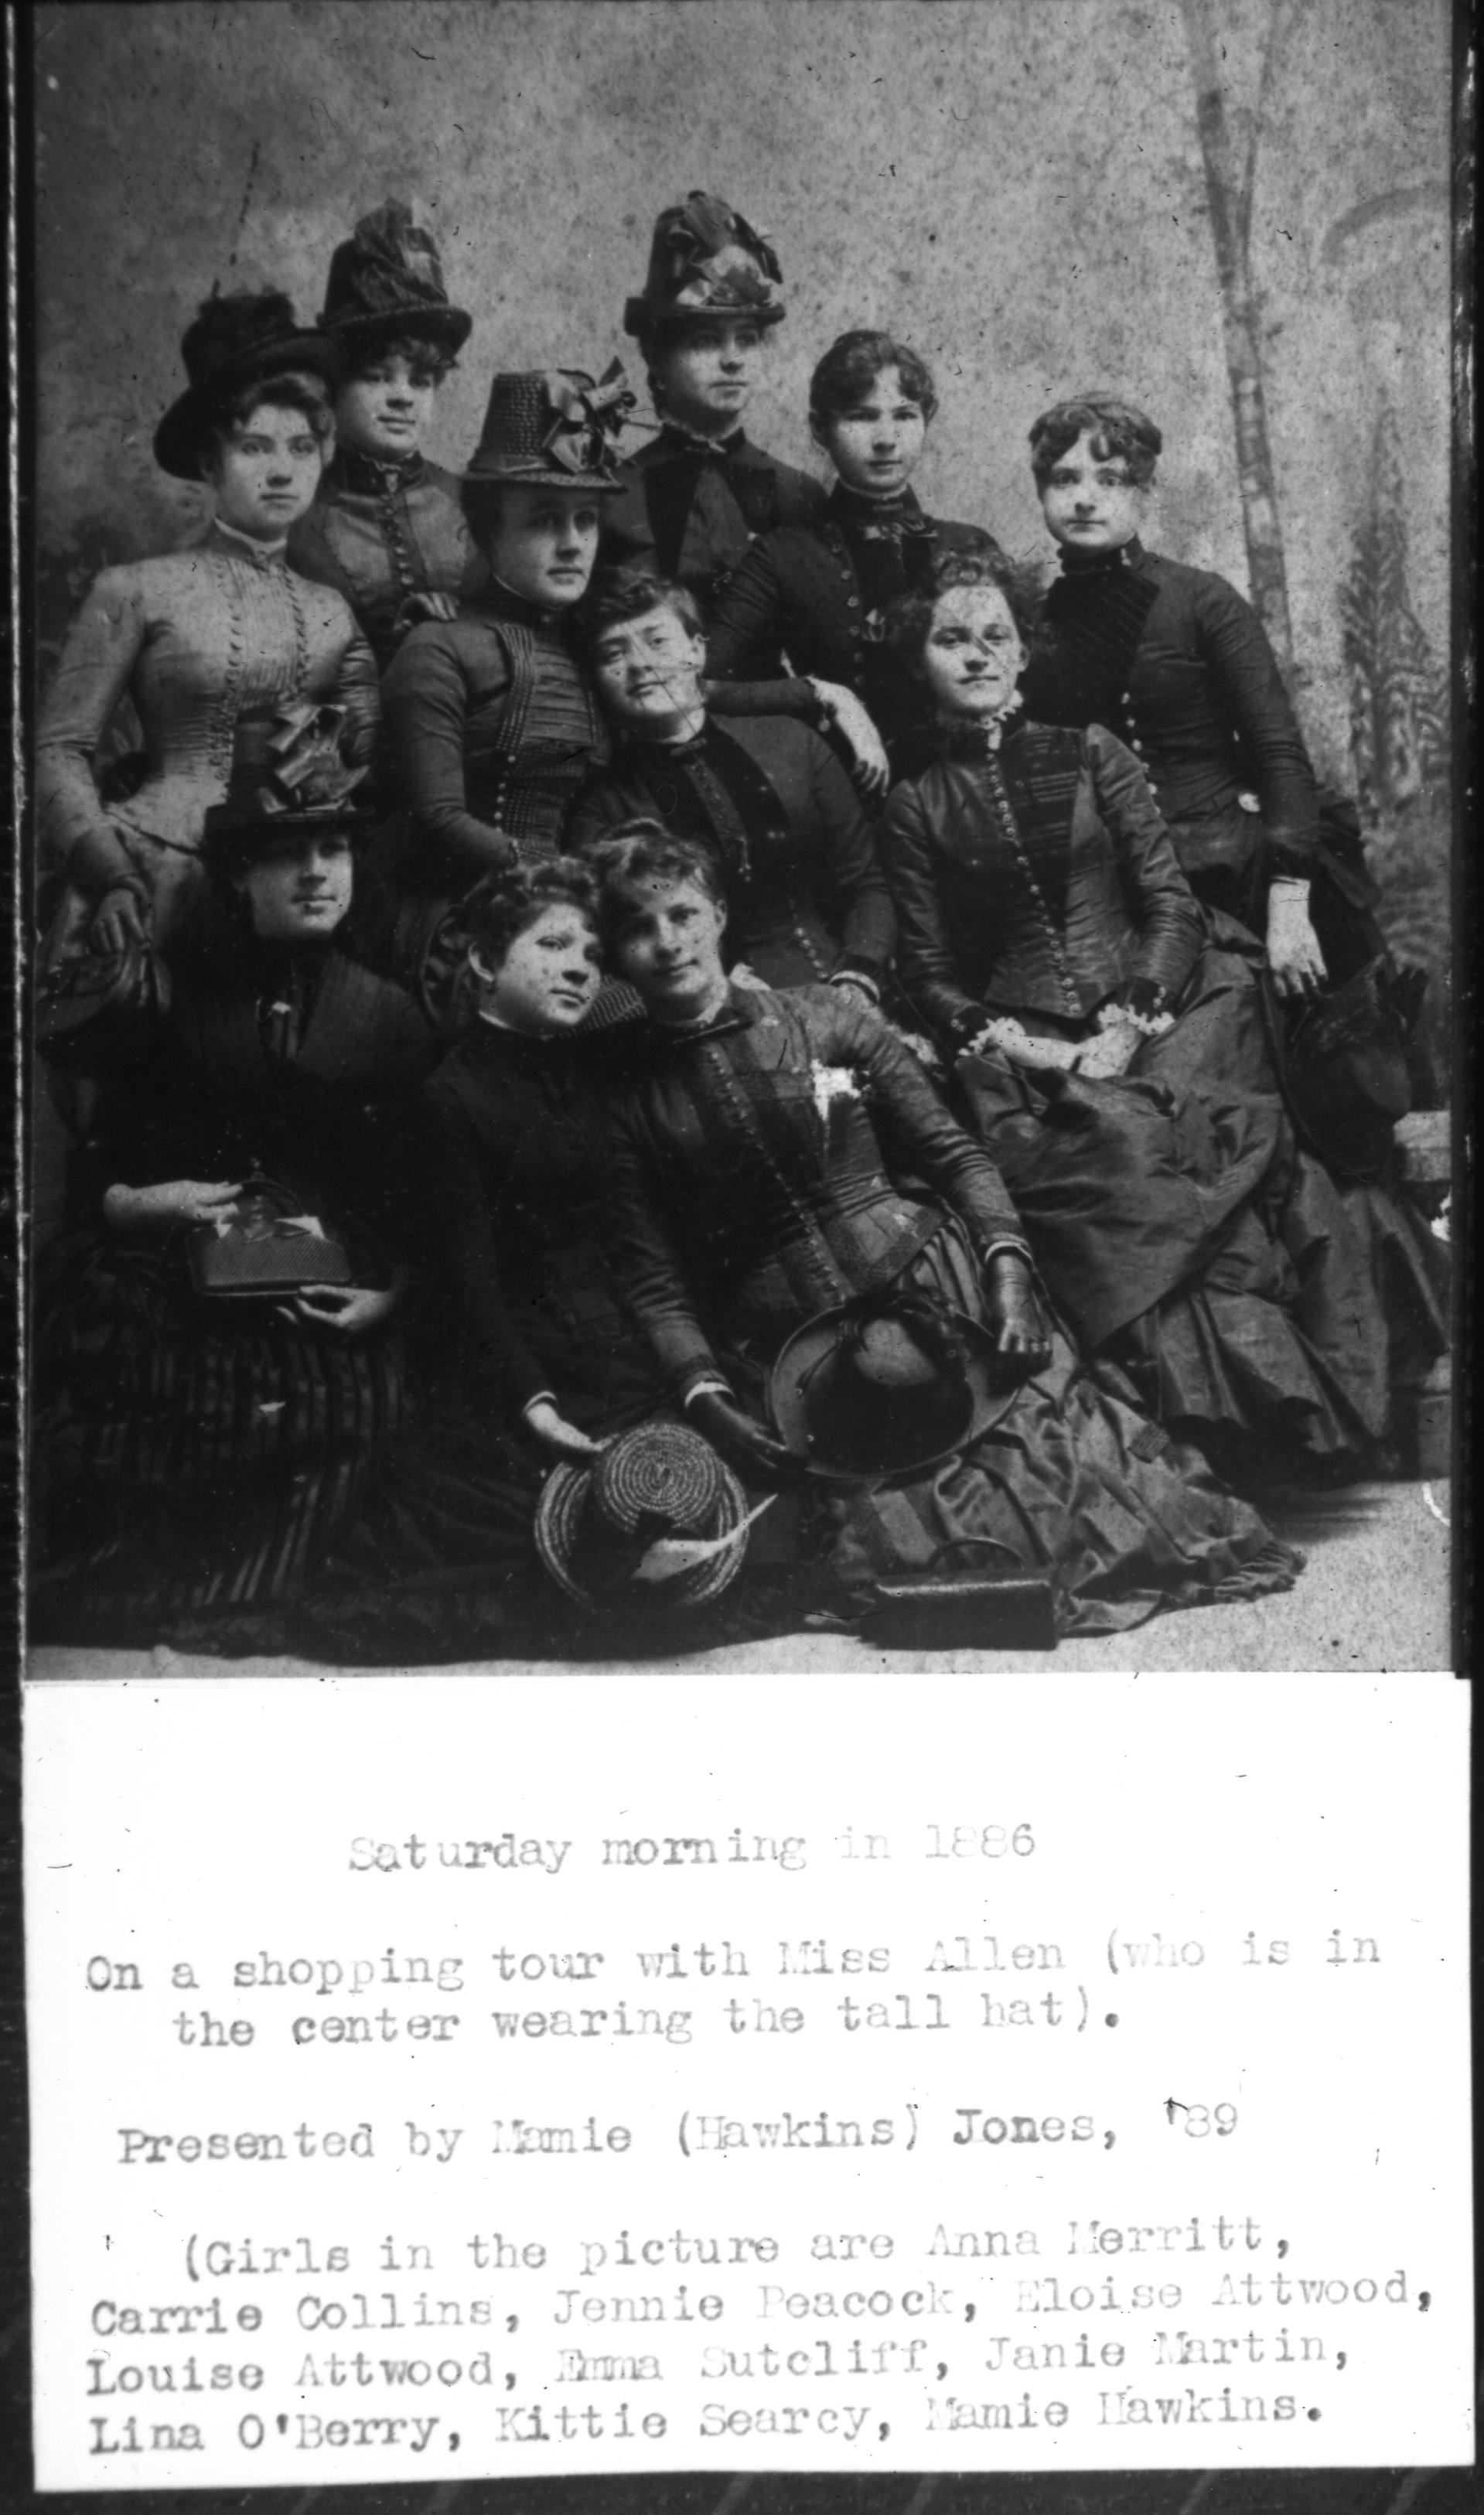 Saturday Morning in 1886